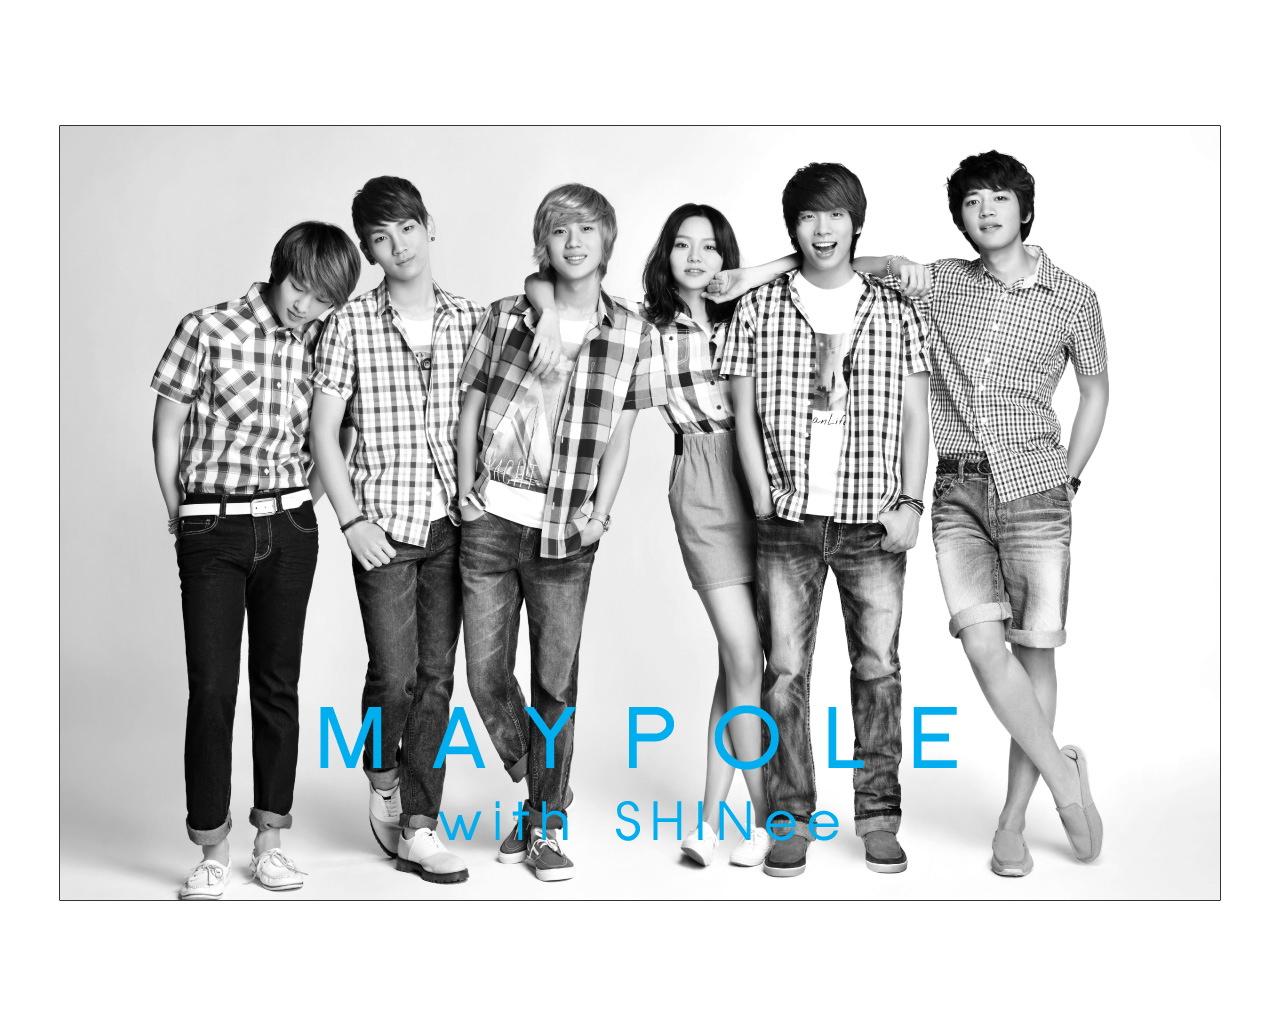 SHINee 韩国青春帅哥组合 代言 MAYPOLE(壁纸1)